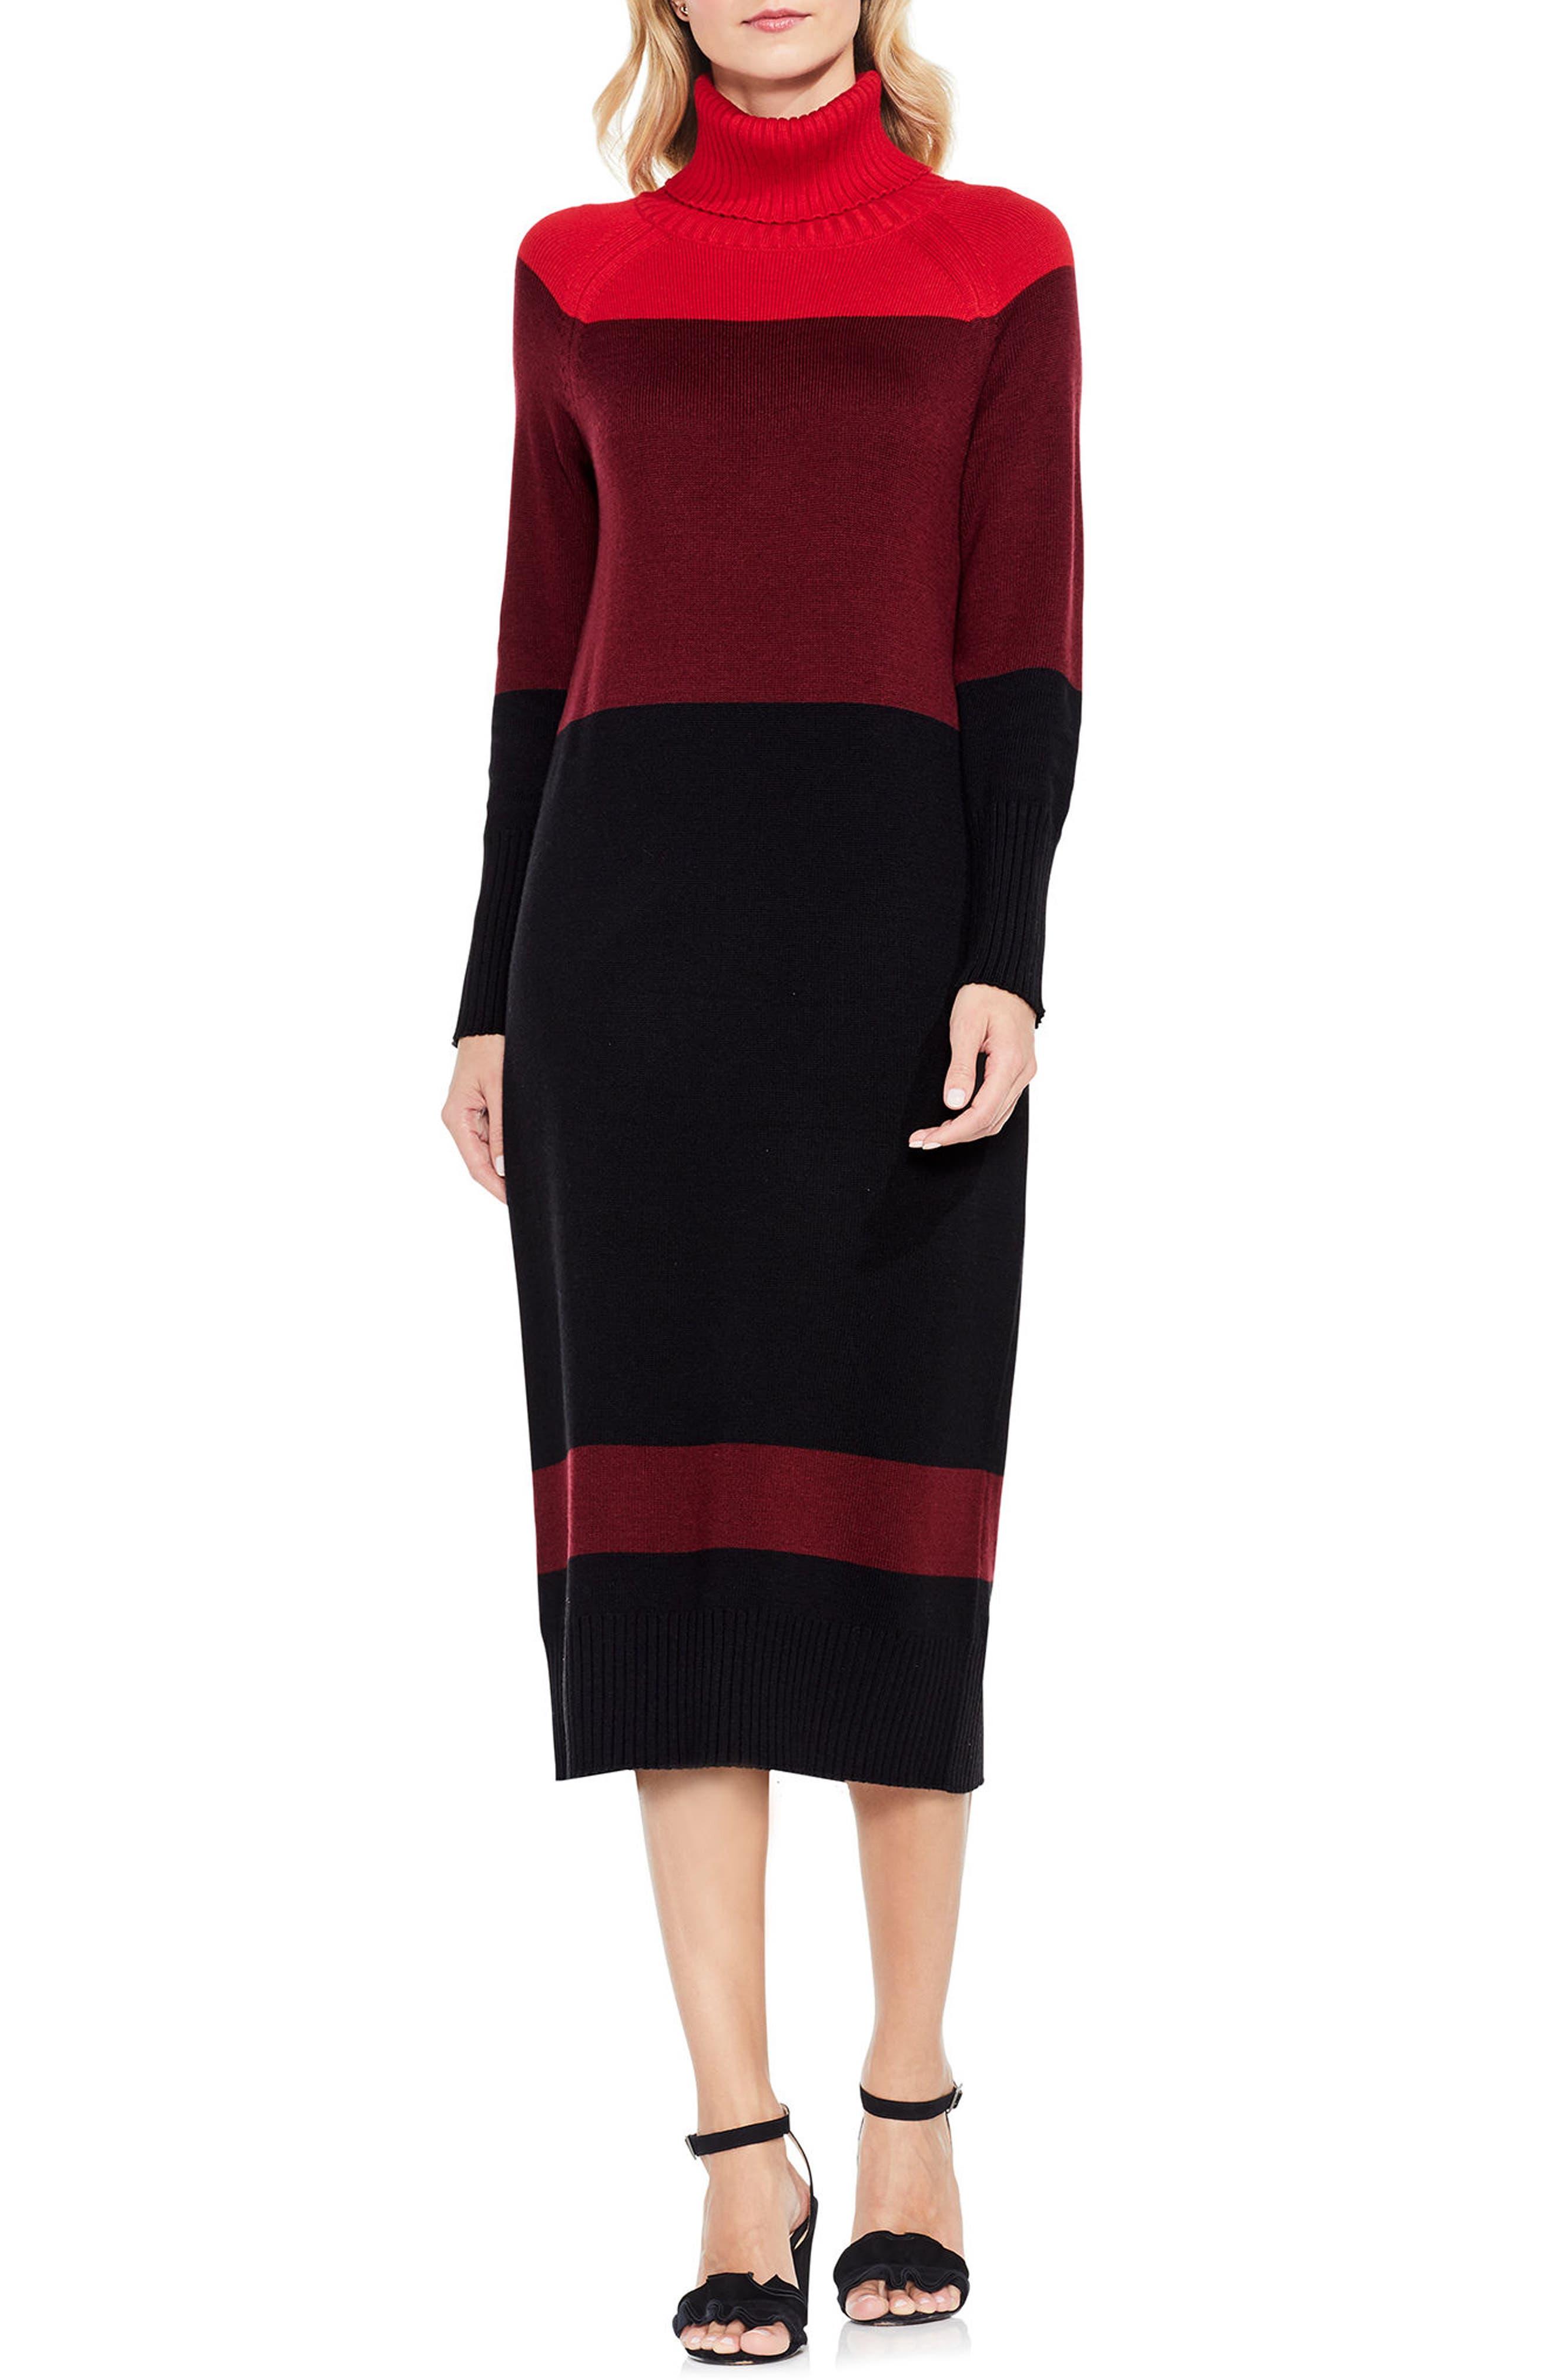 Alternate Image 1 Selected - Vince Camuto Colorblock Turtleneck Sweater Dress